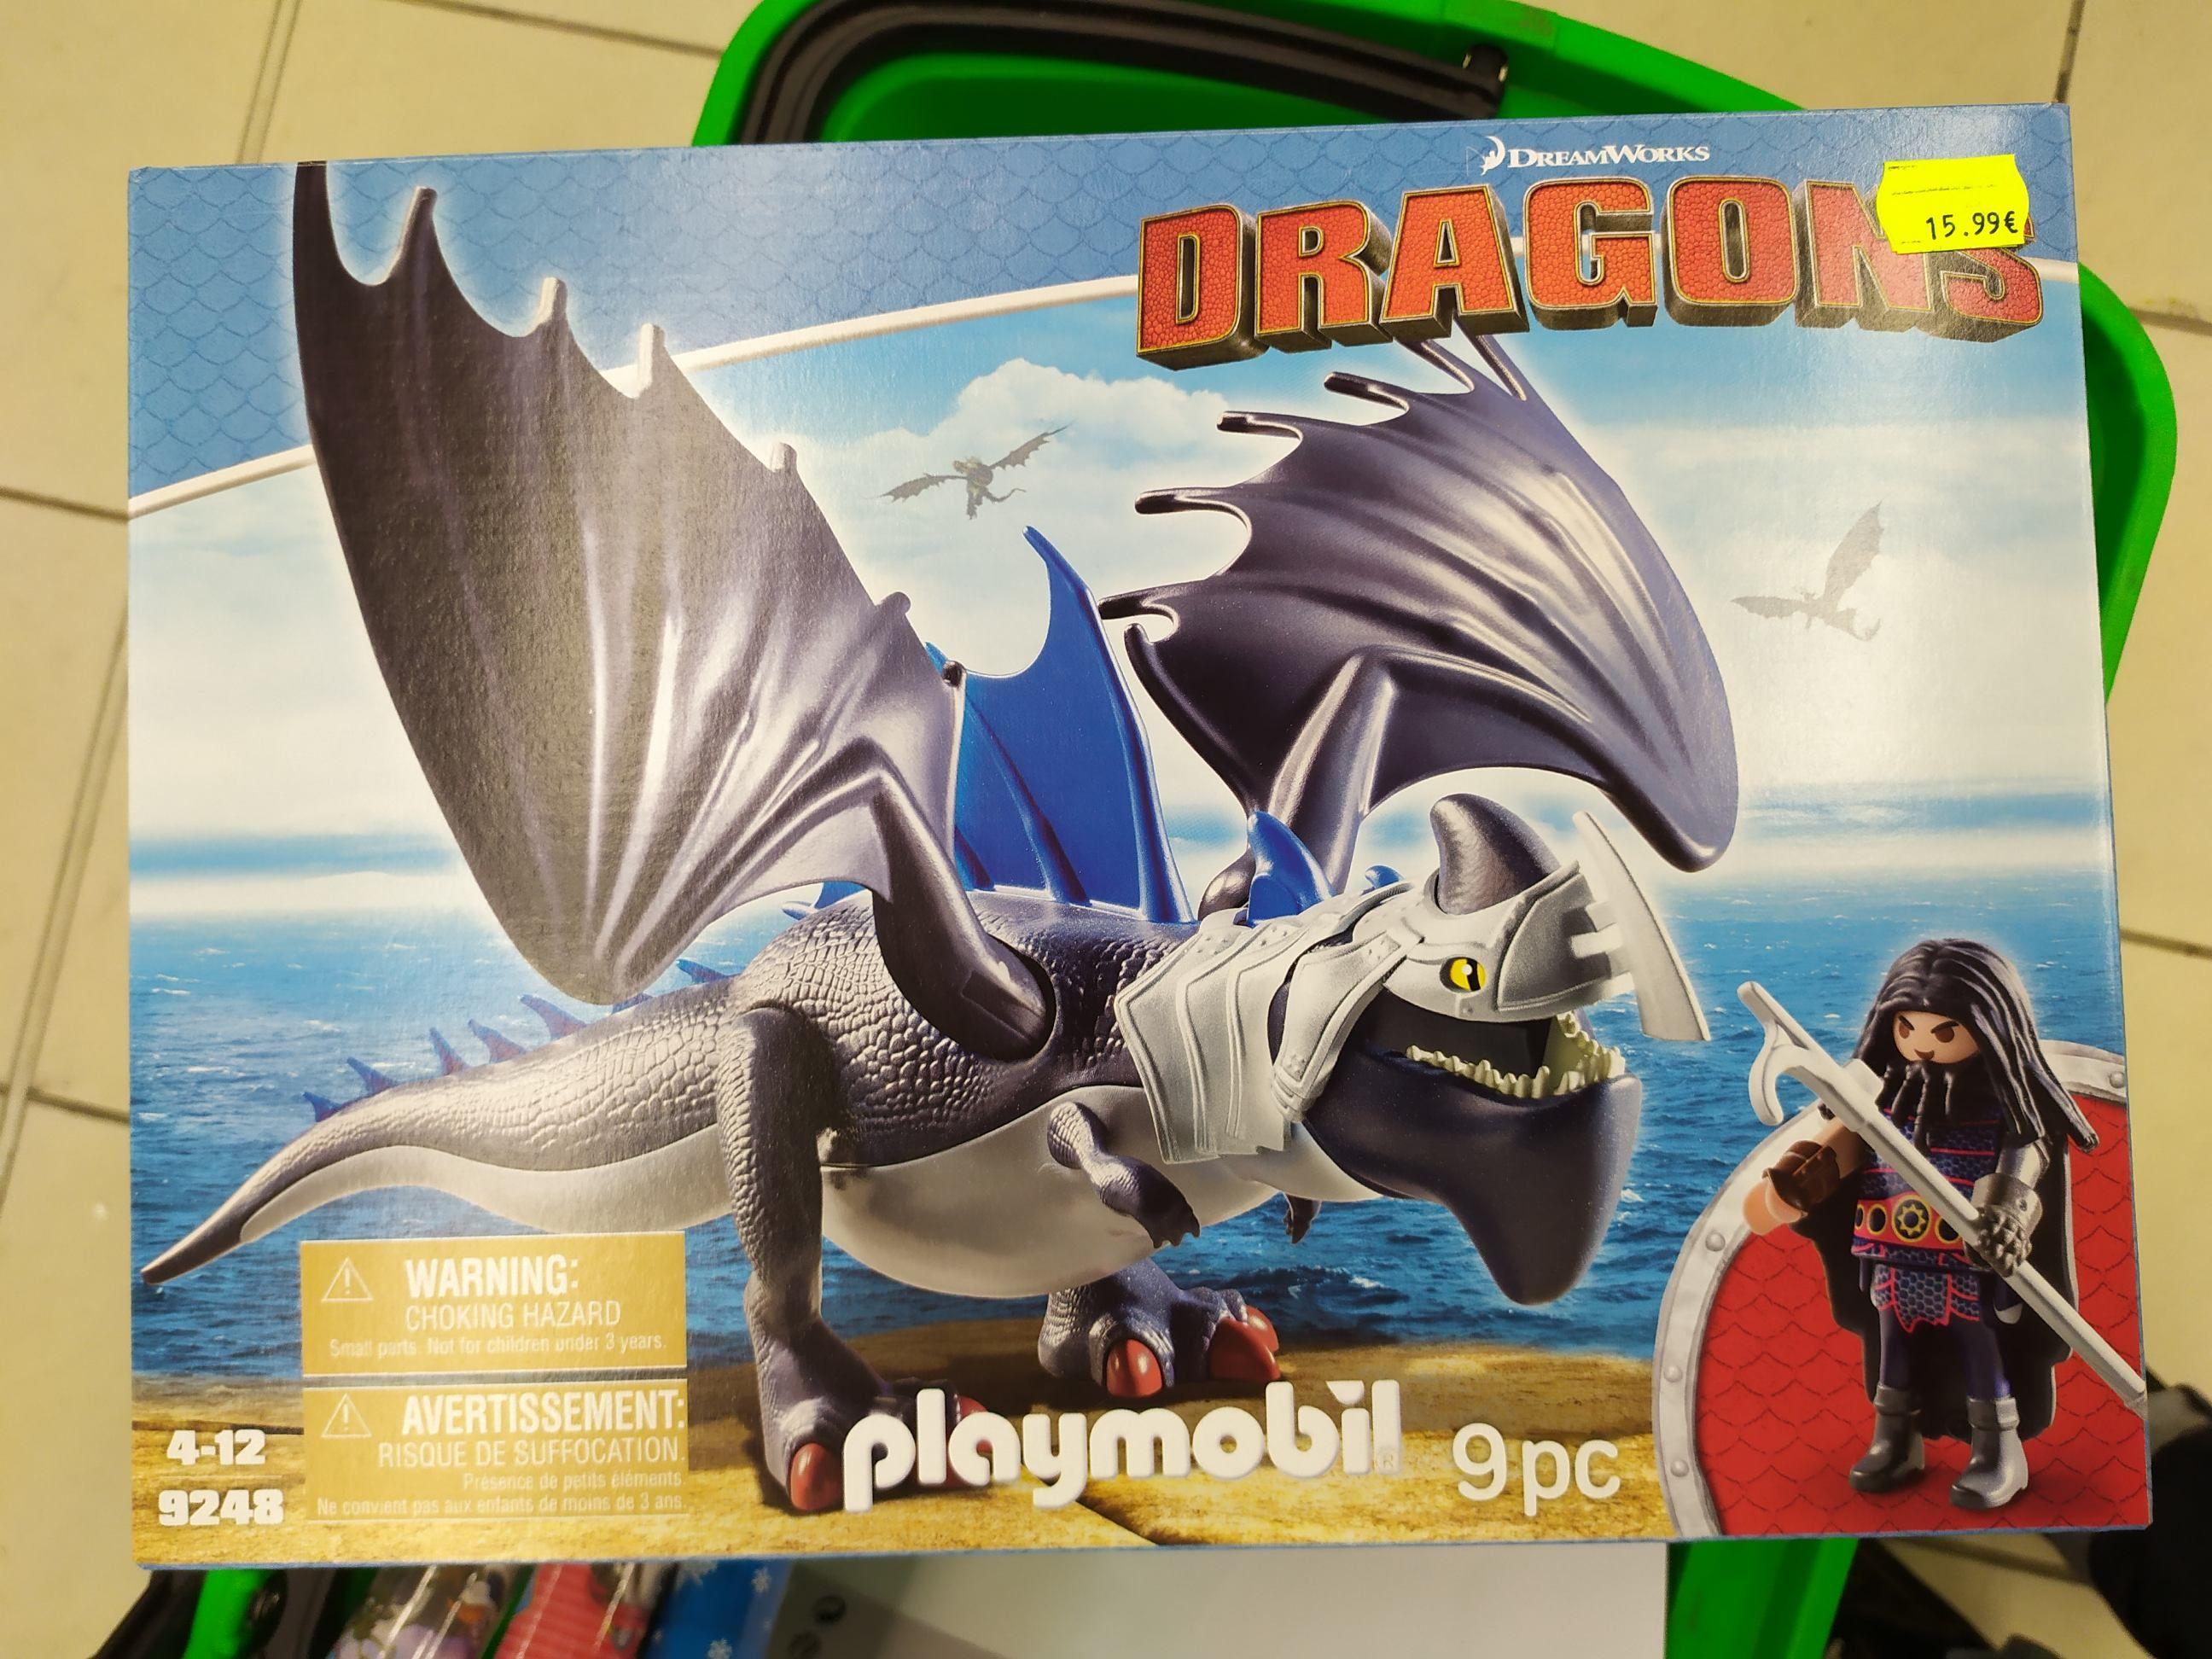 Jouet Playmobil 9248 Dragons - Drago avec dragon de combat - Ardèche (07) / Valence (26)